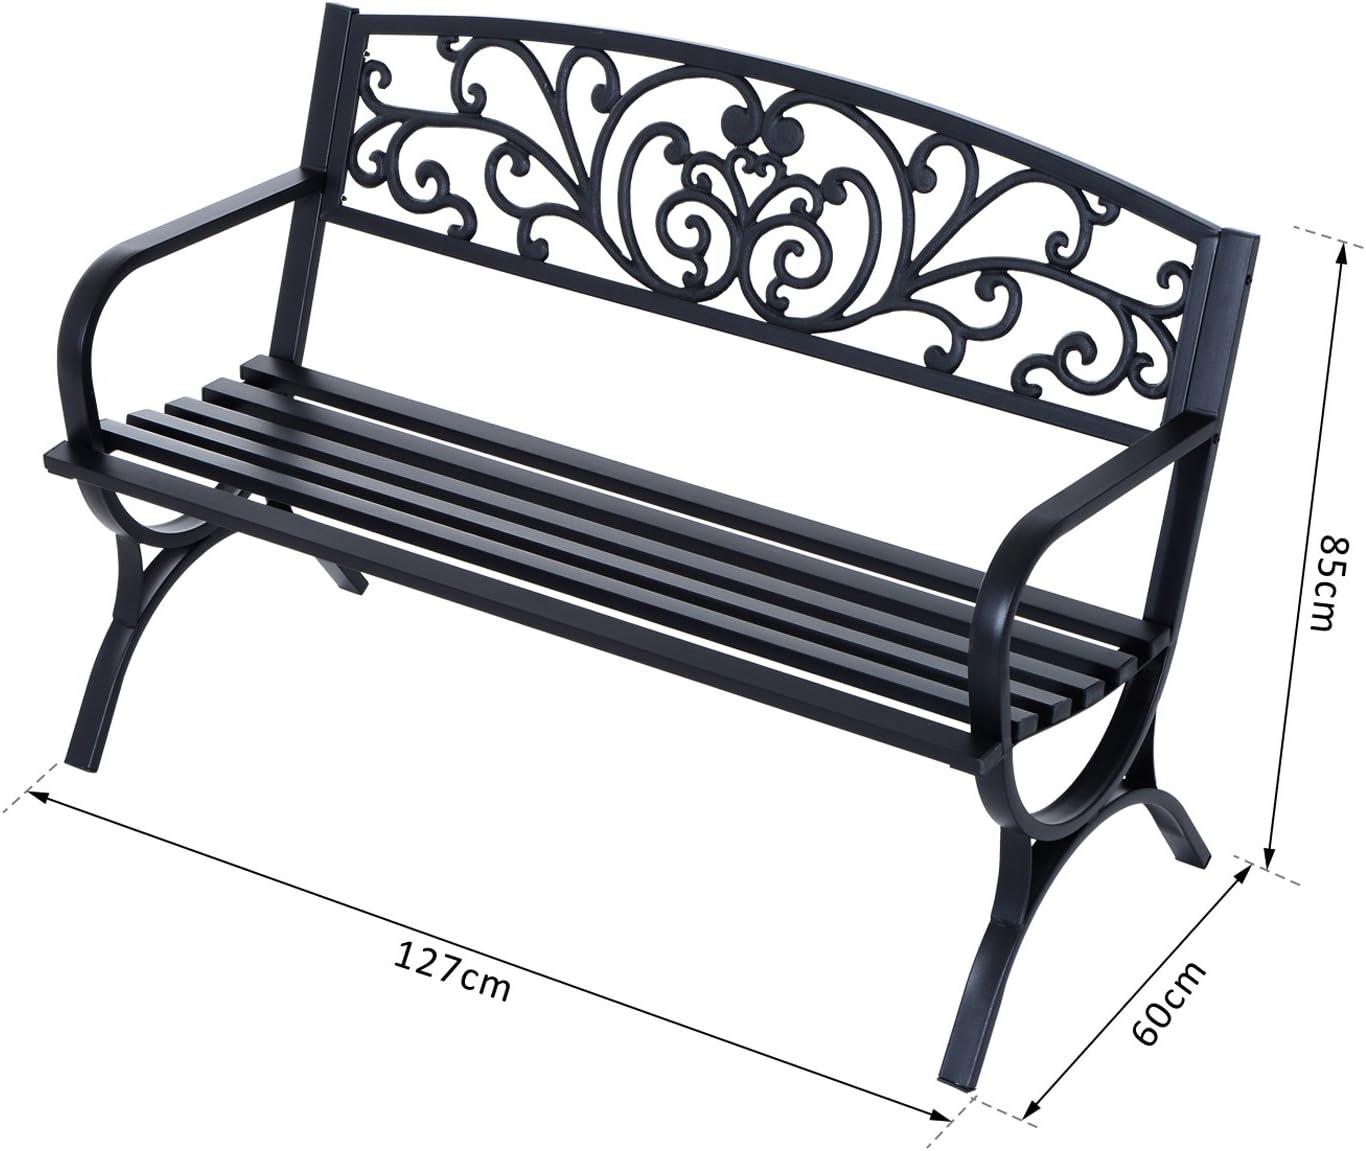 Amazon.com: Outsunny 84B-009 Product Aosom: Jardín y Exteriores